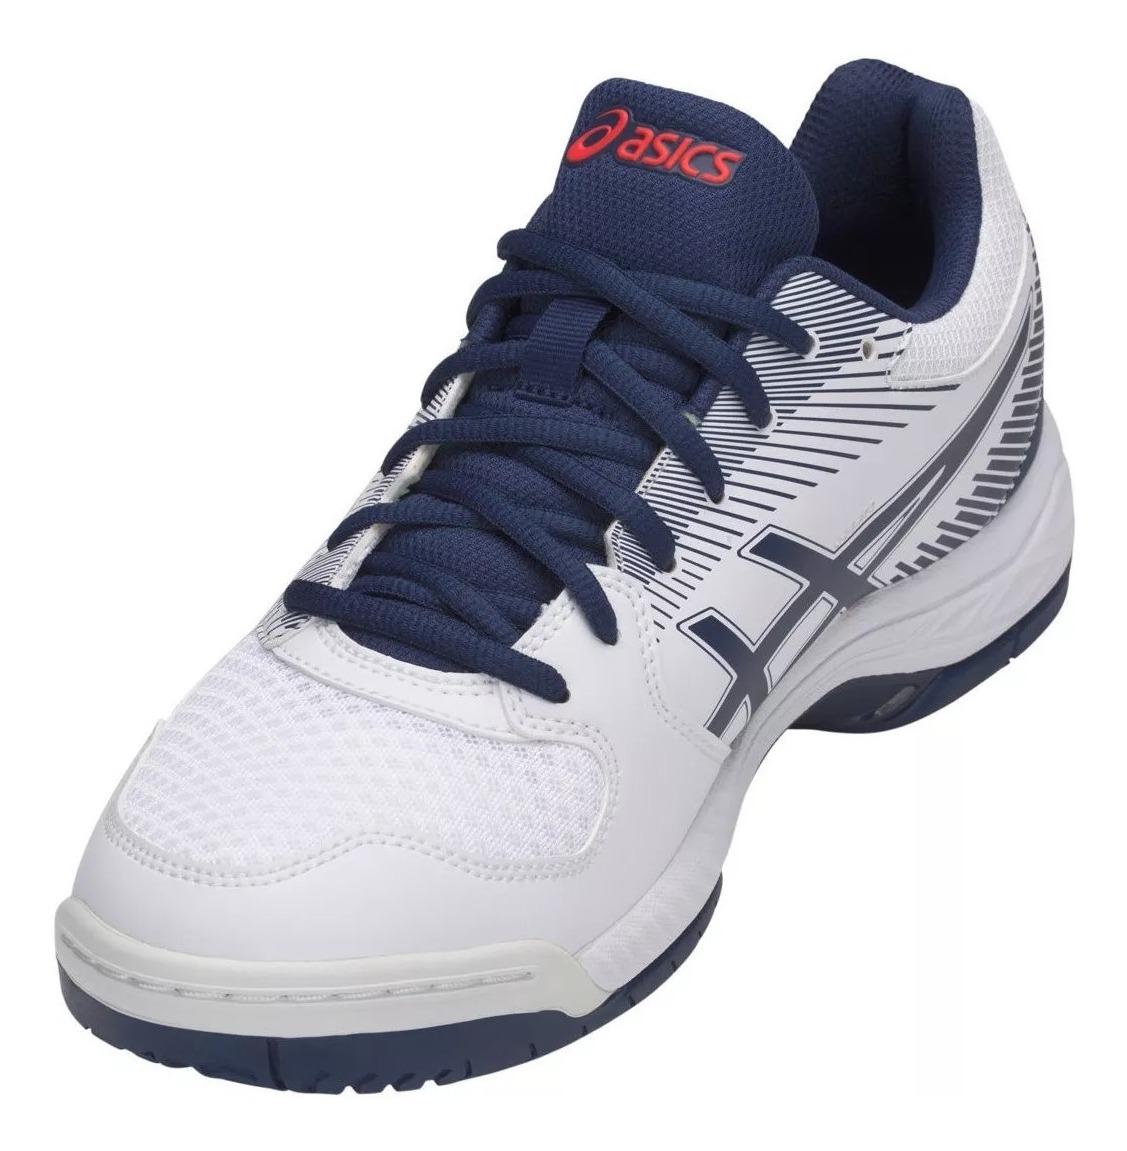 zapatillas mizuno gama alta definicion usa 9500